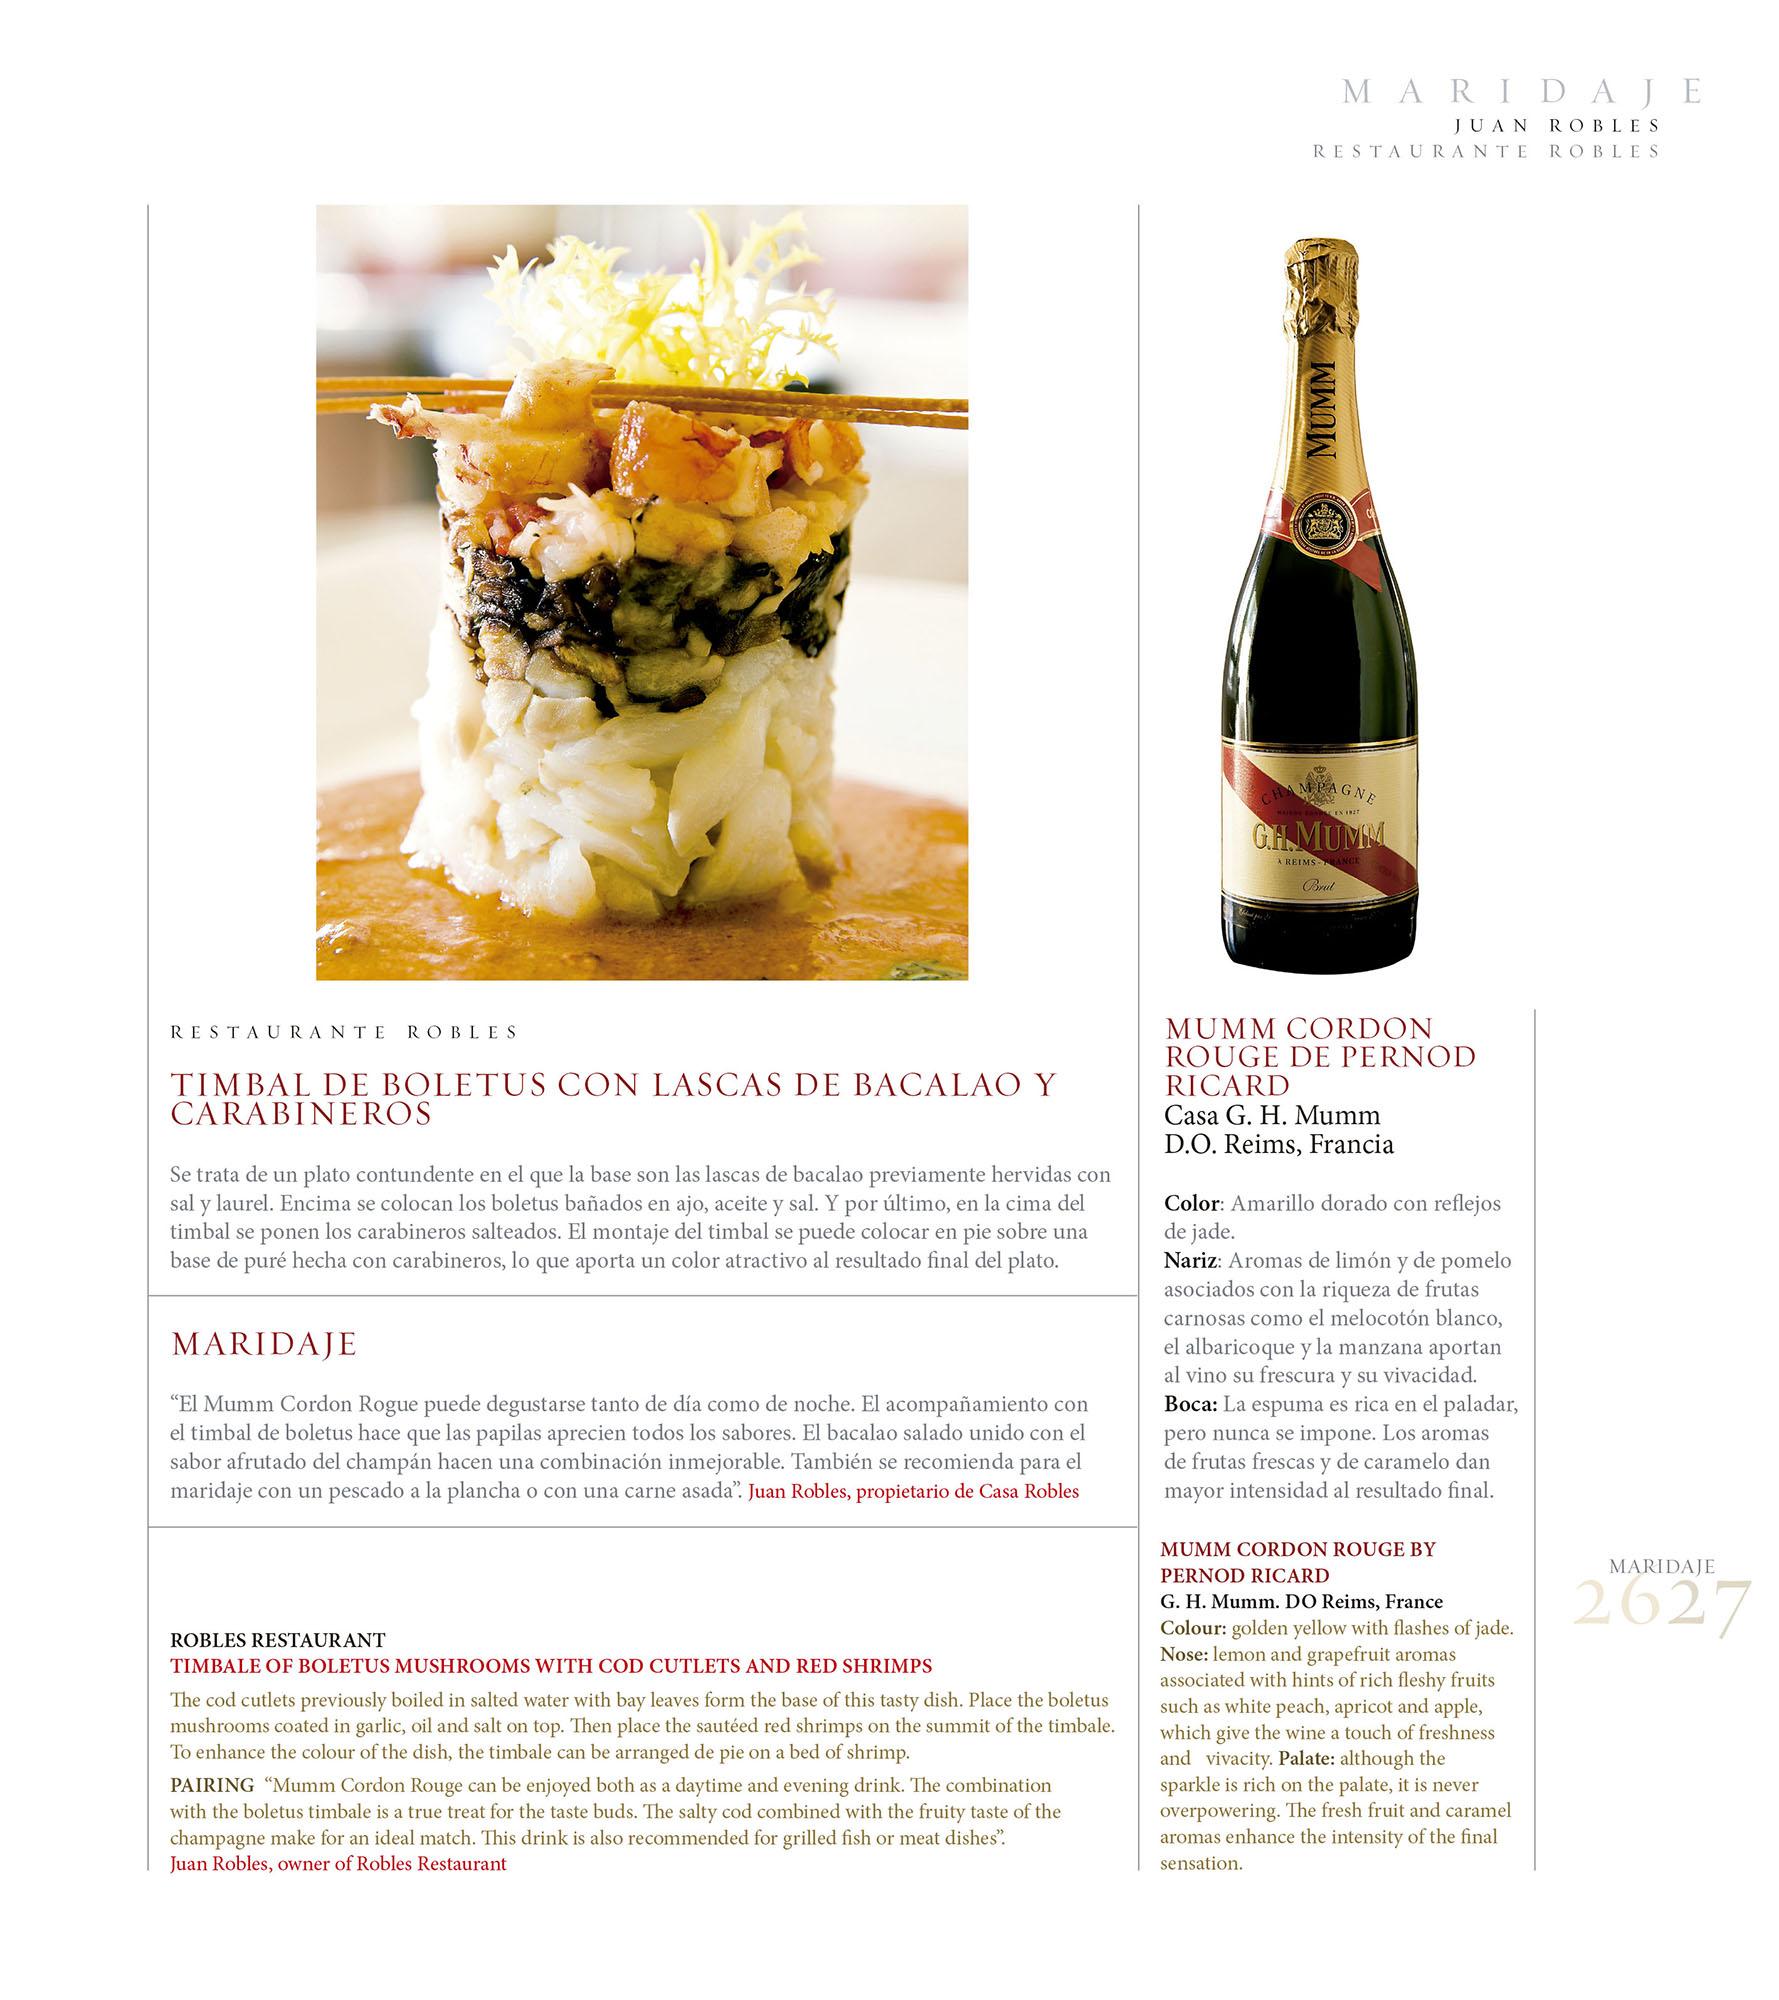 Maridaje – Casa Robles | Revista ORO | dic 2009